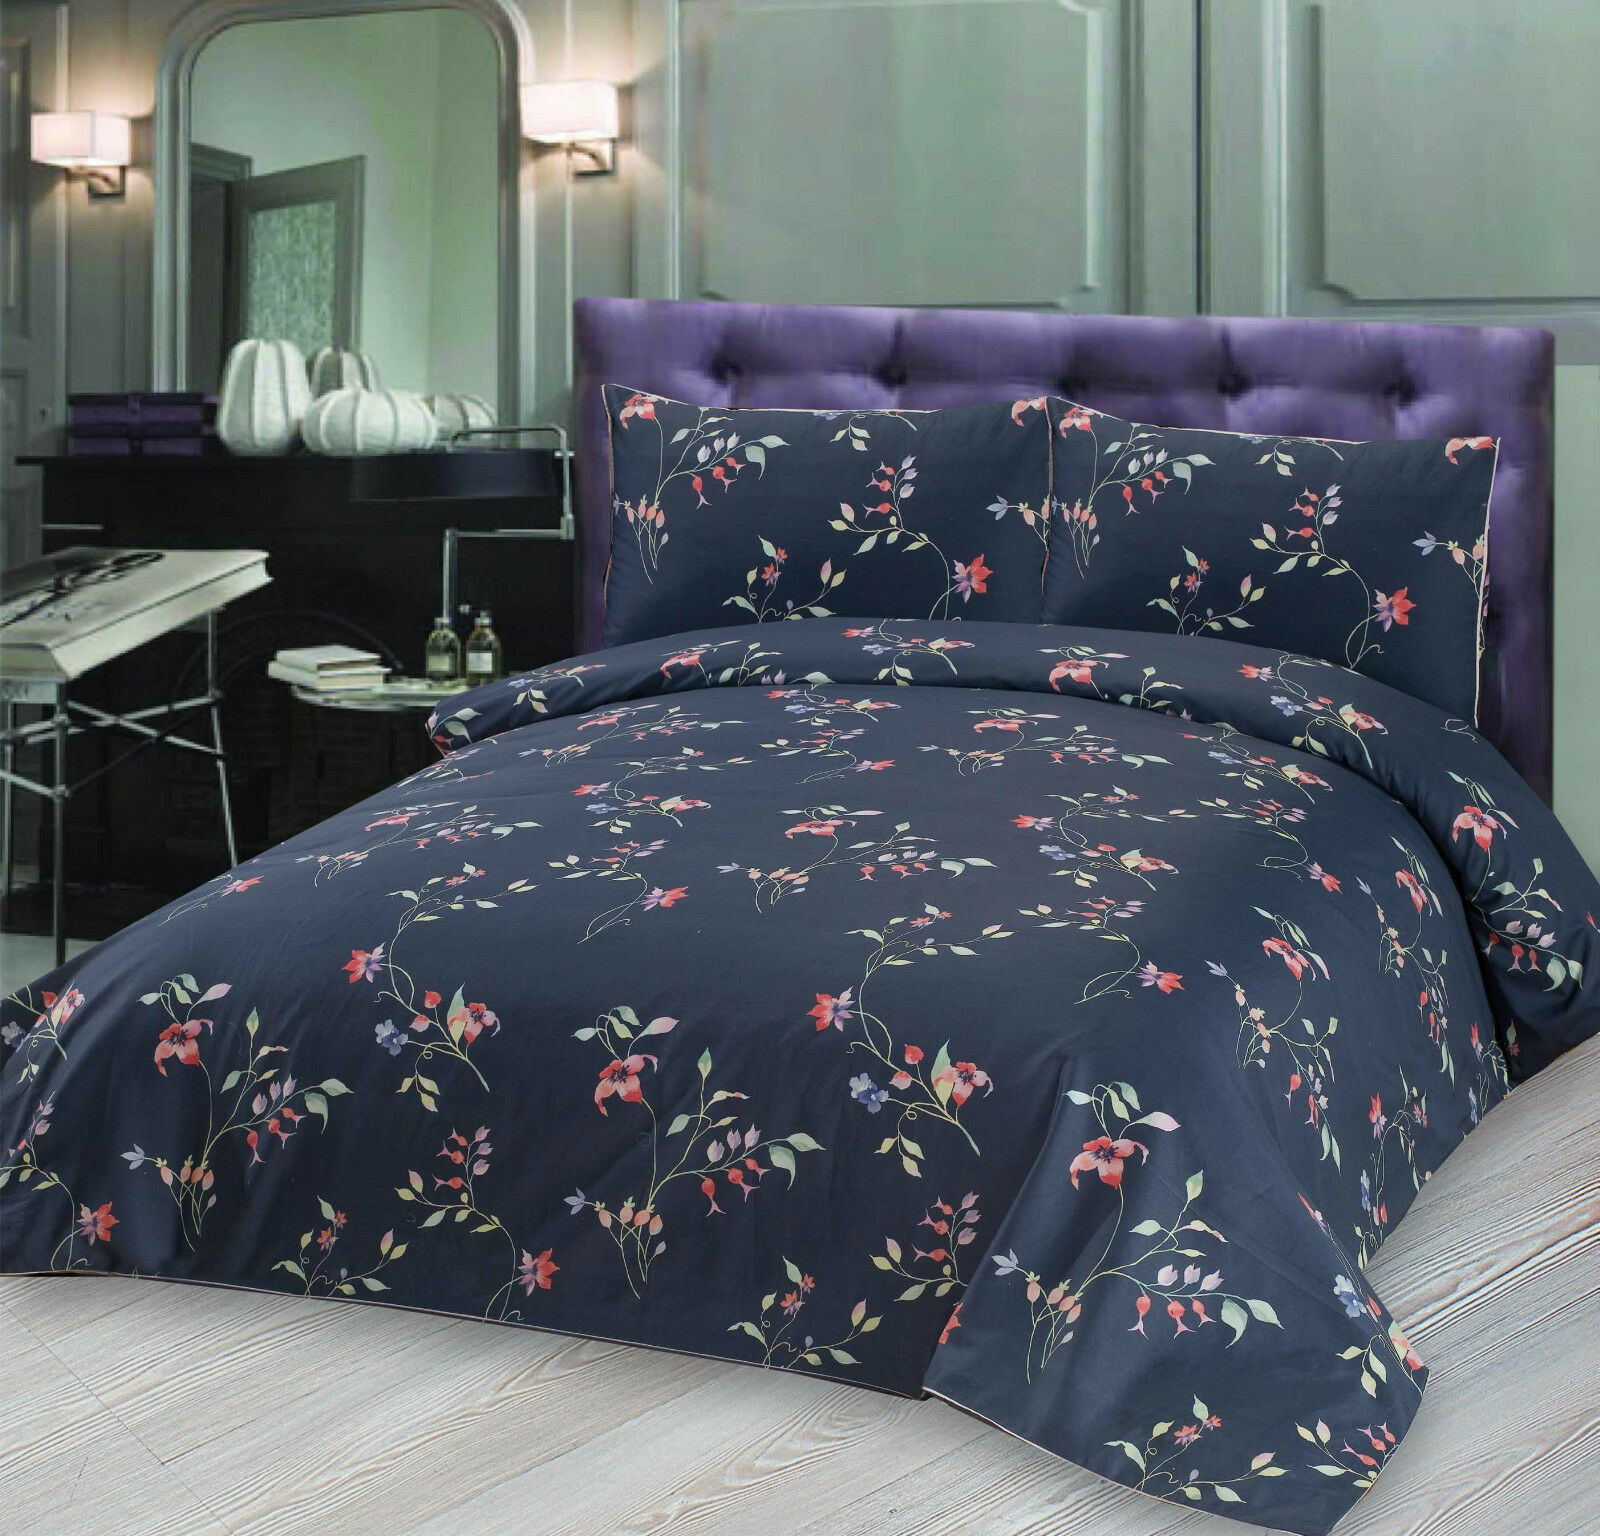 Blau Flowers Printed Premium 300TC 100% Cotton Sateen Duvet Cover Bed Set